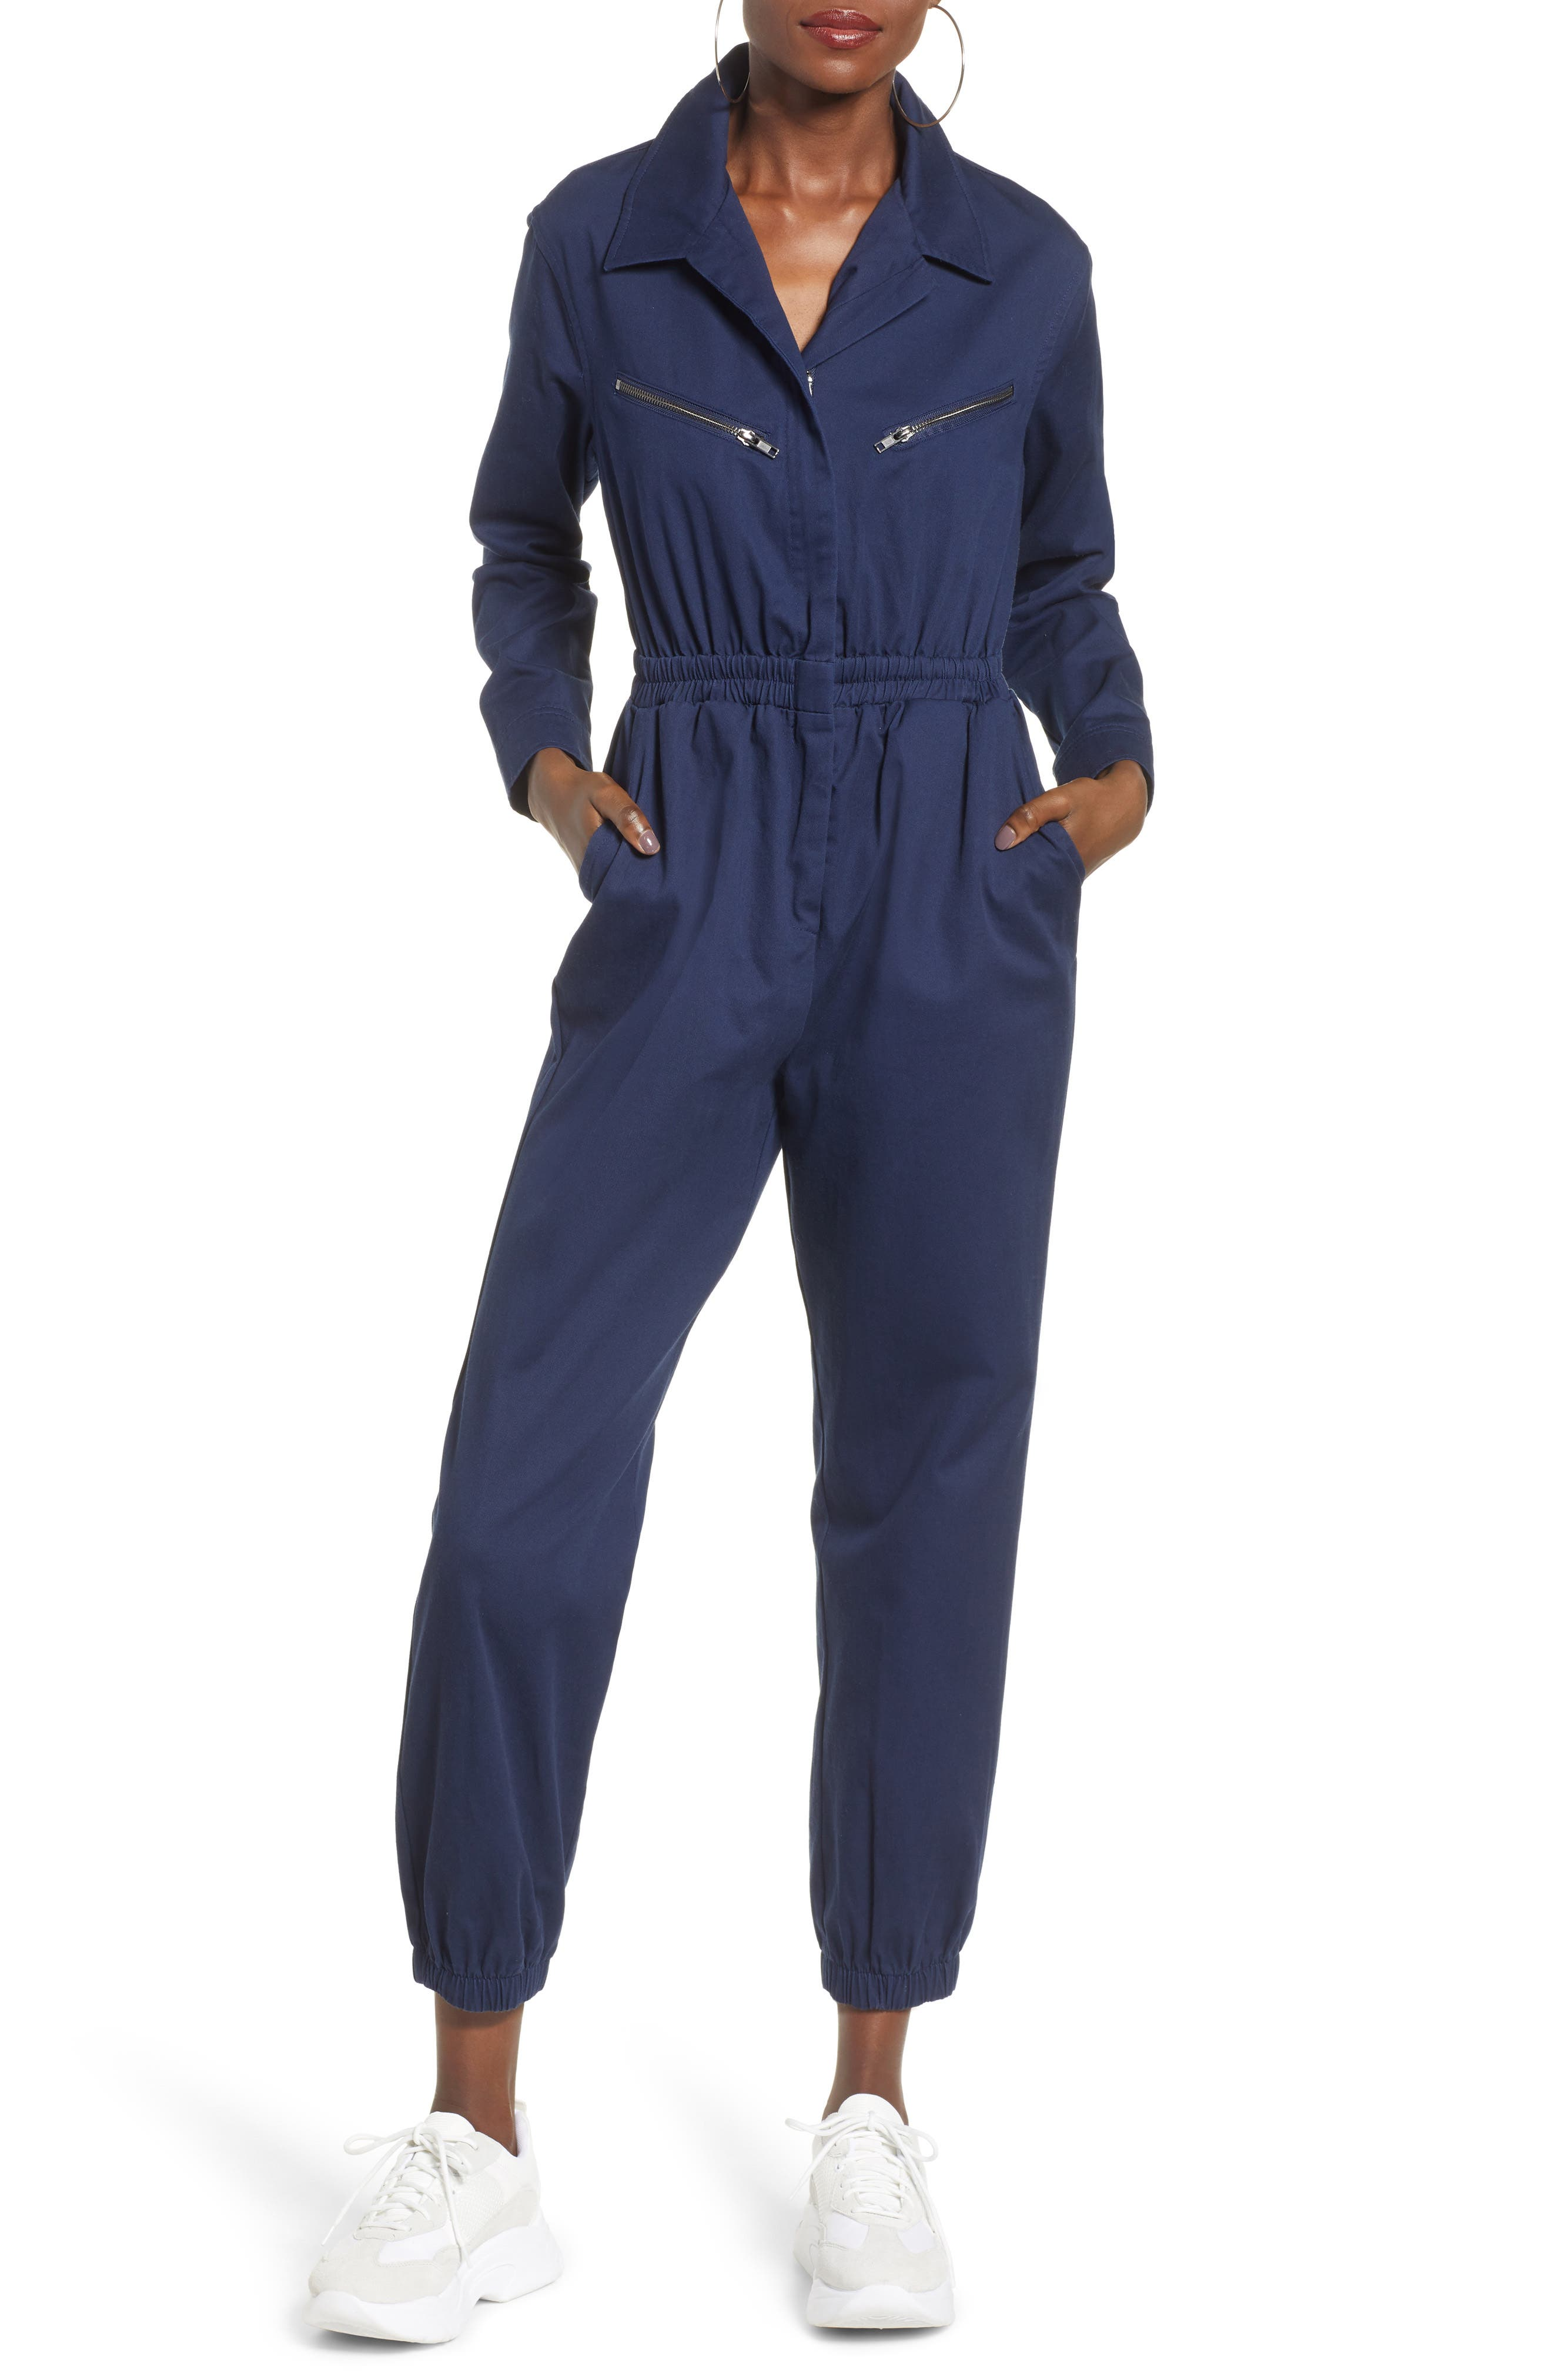 TEN SIXTY SHERMAN, Twill Workwear Jumpsuit, Main thumbnail 1, color, 400